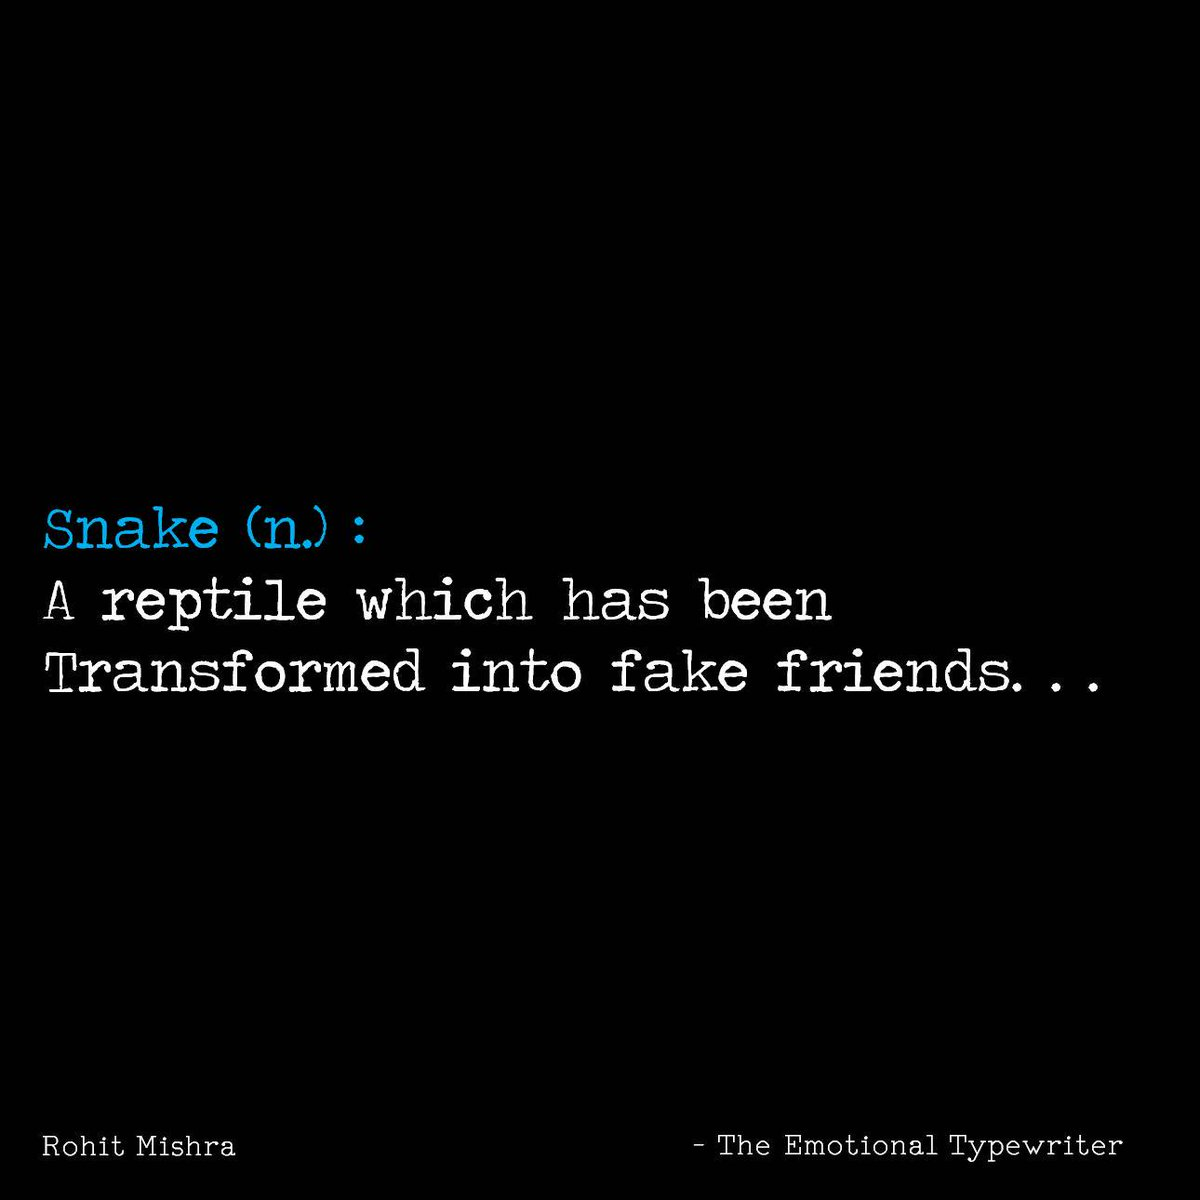 Emotionaltypewriter On Twitter Snake Fakefriends Tet